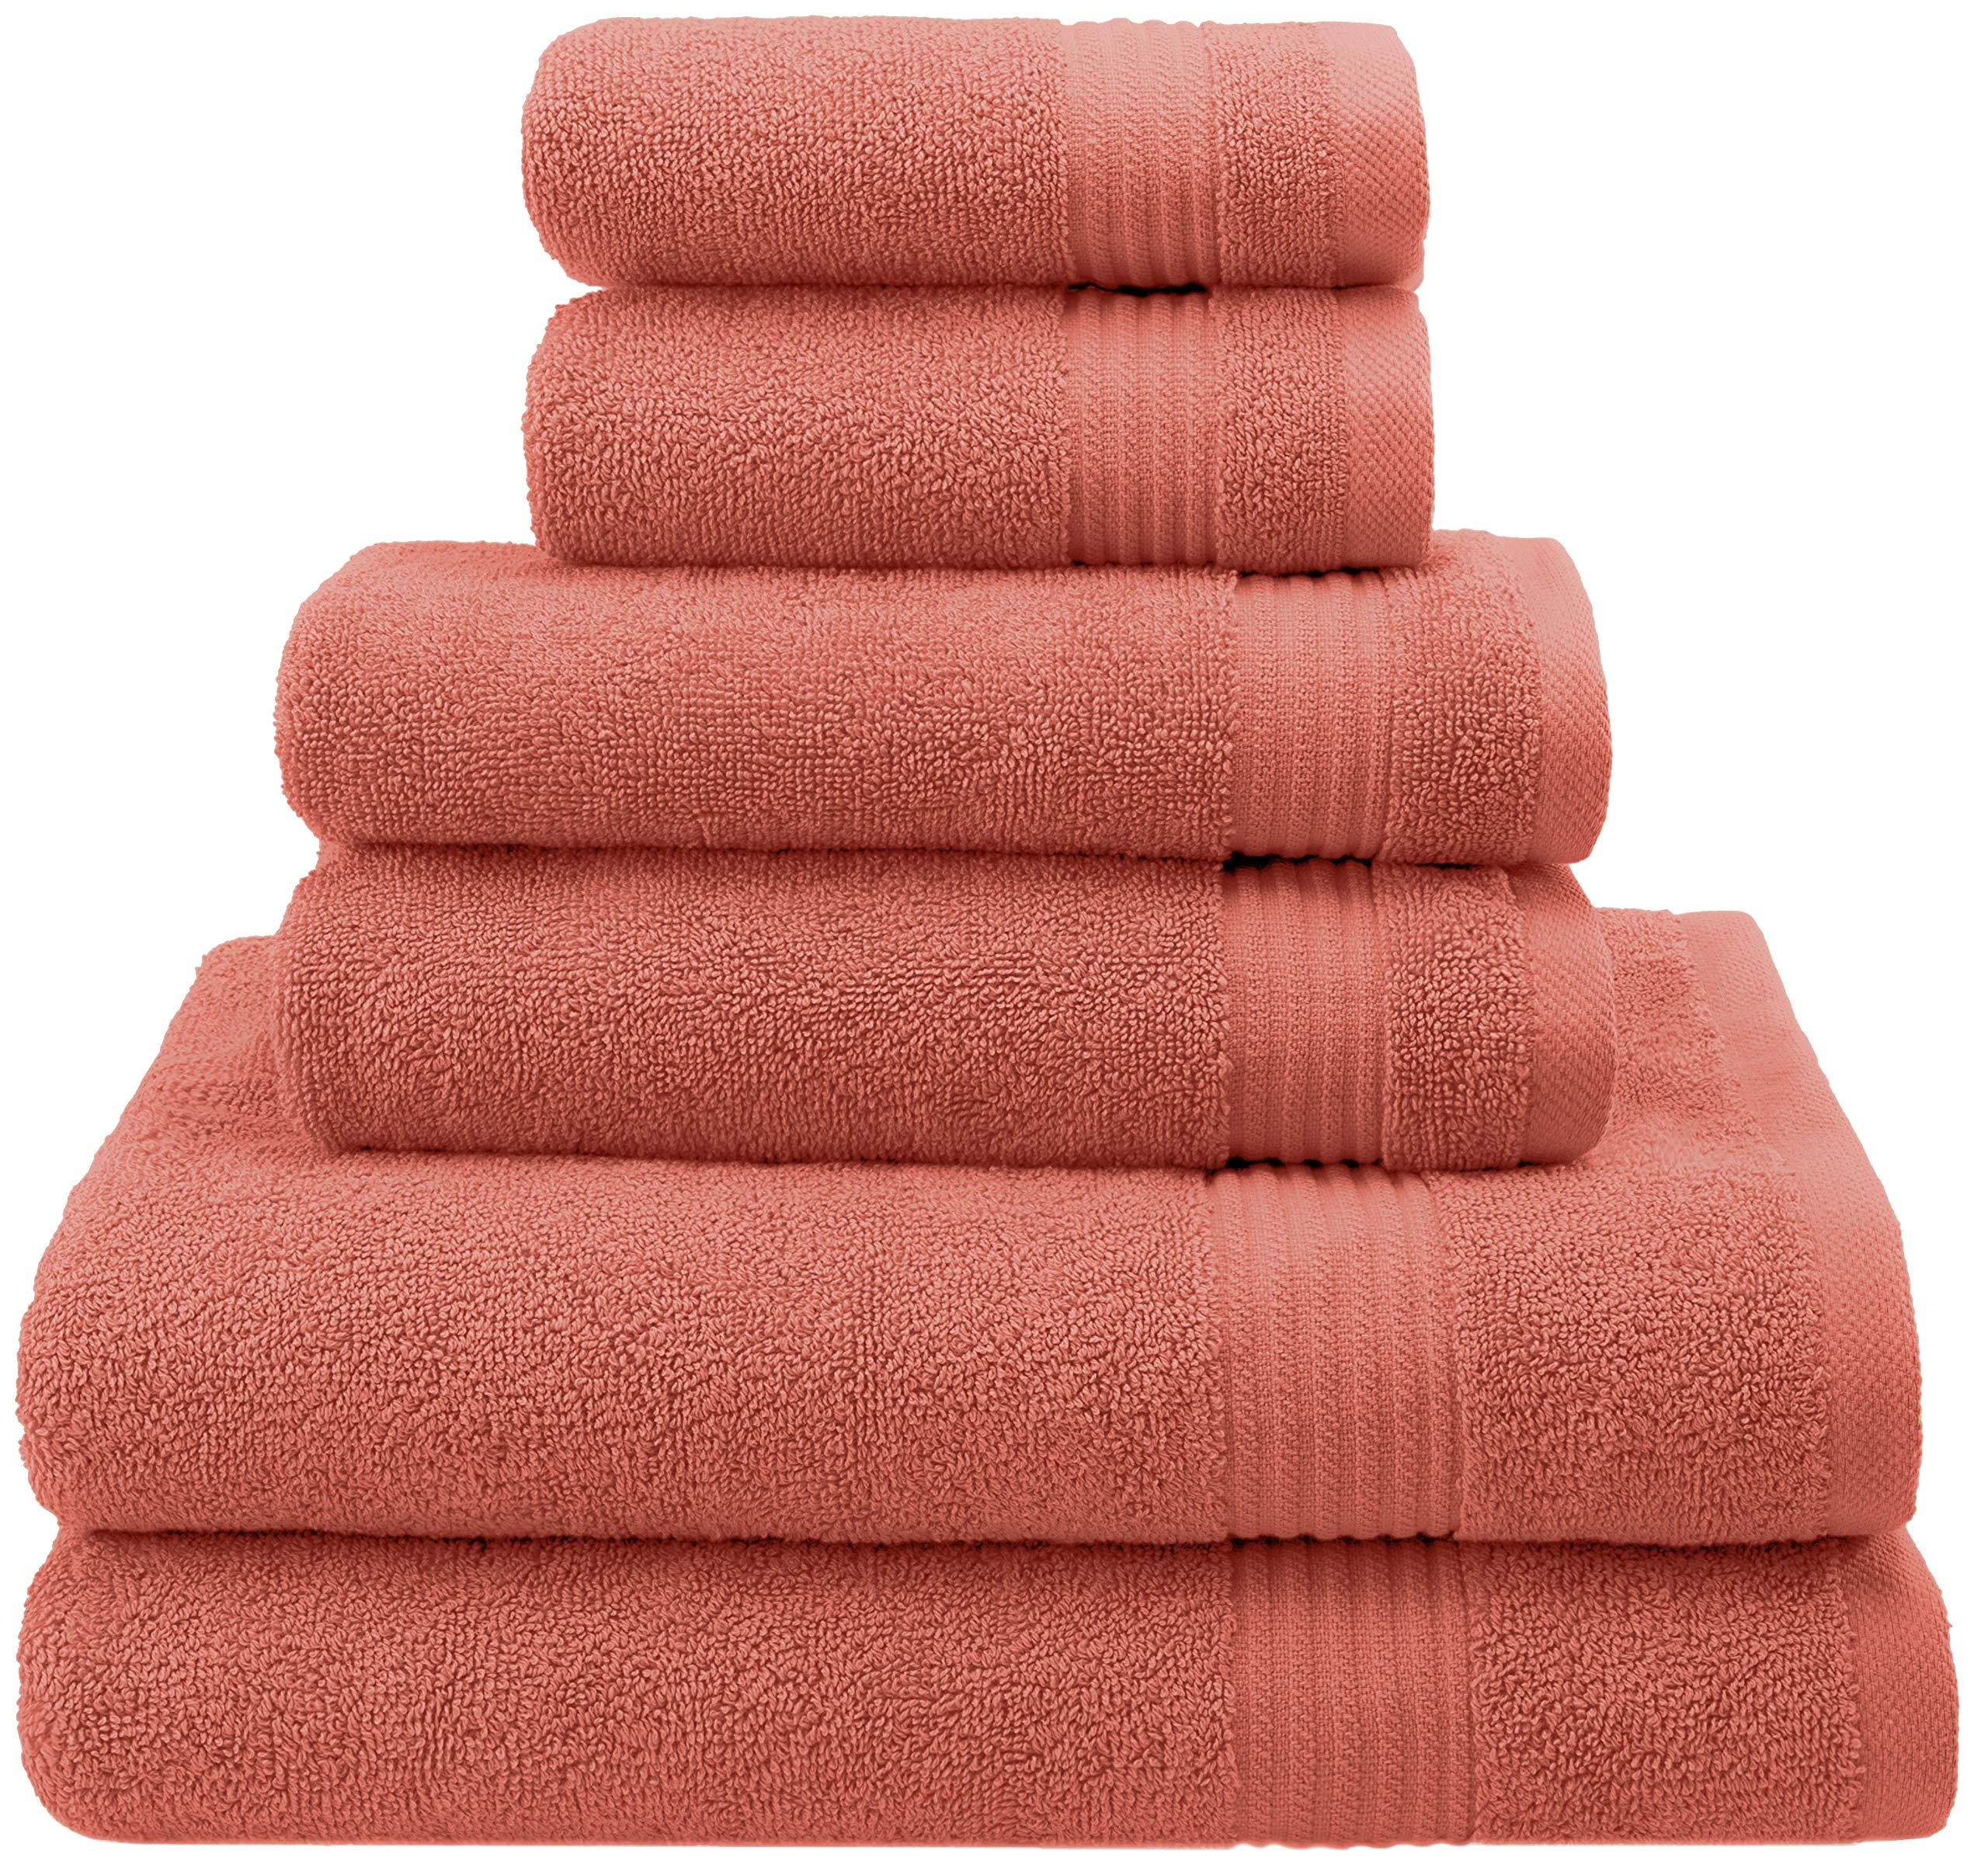 Absorbent /& Soft Decorative Kitchen /& Bathroom Turkish Towels Cotton Paradise Luxury Hotel /& Spa Quality 40 x 80 Bath Sheet, Coral